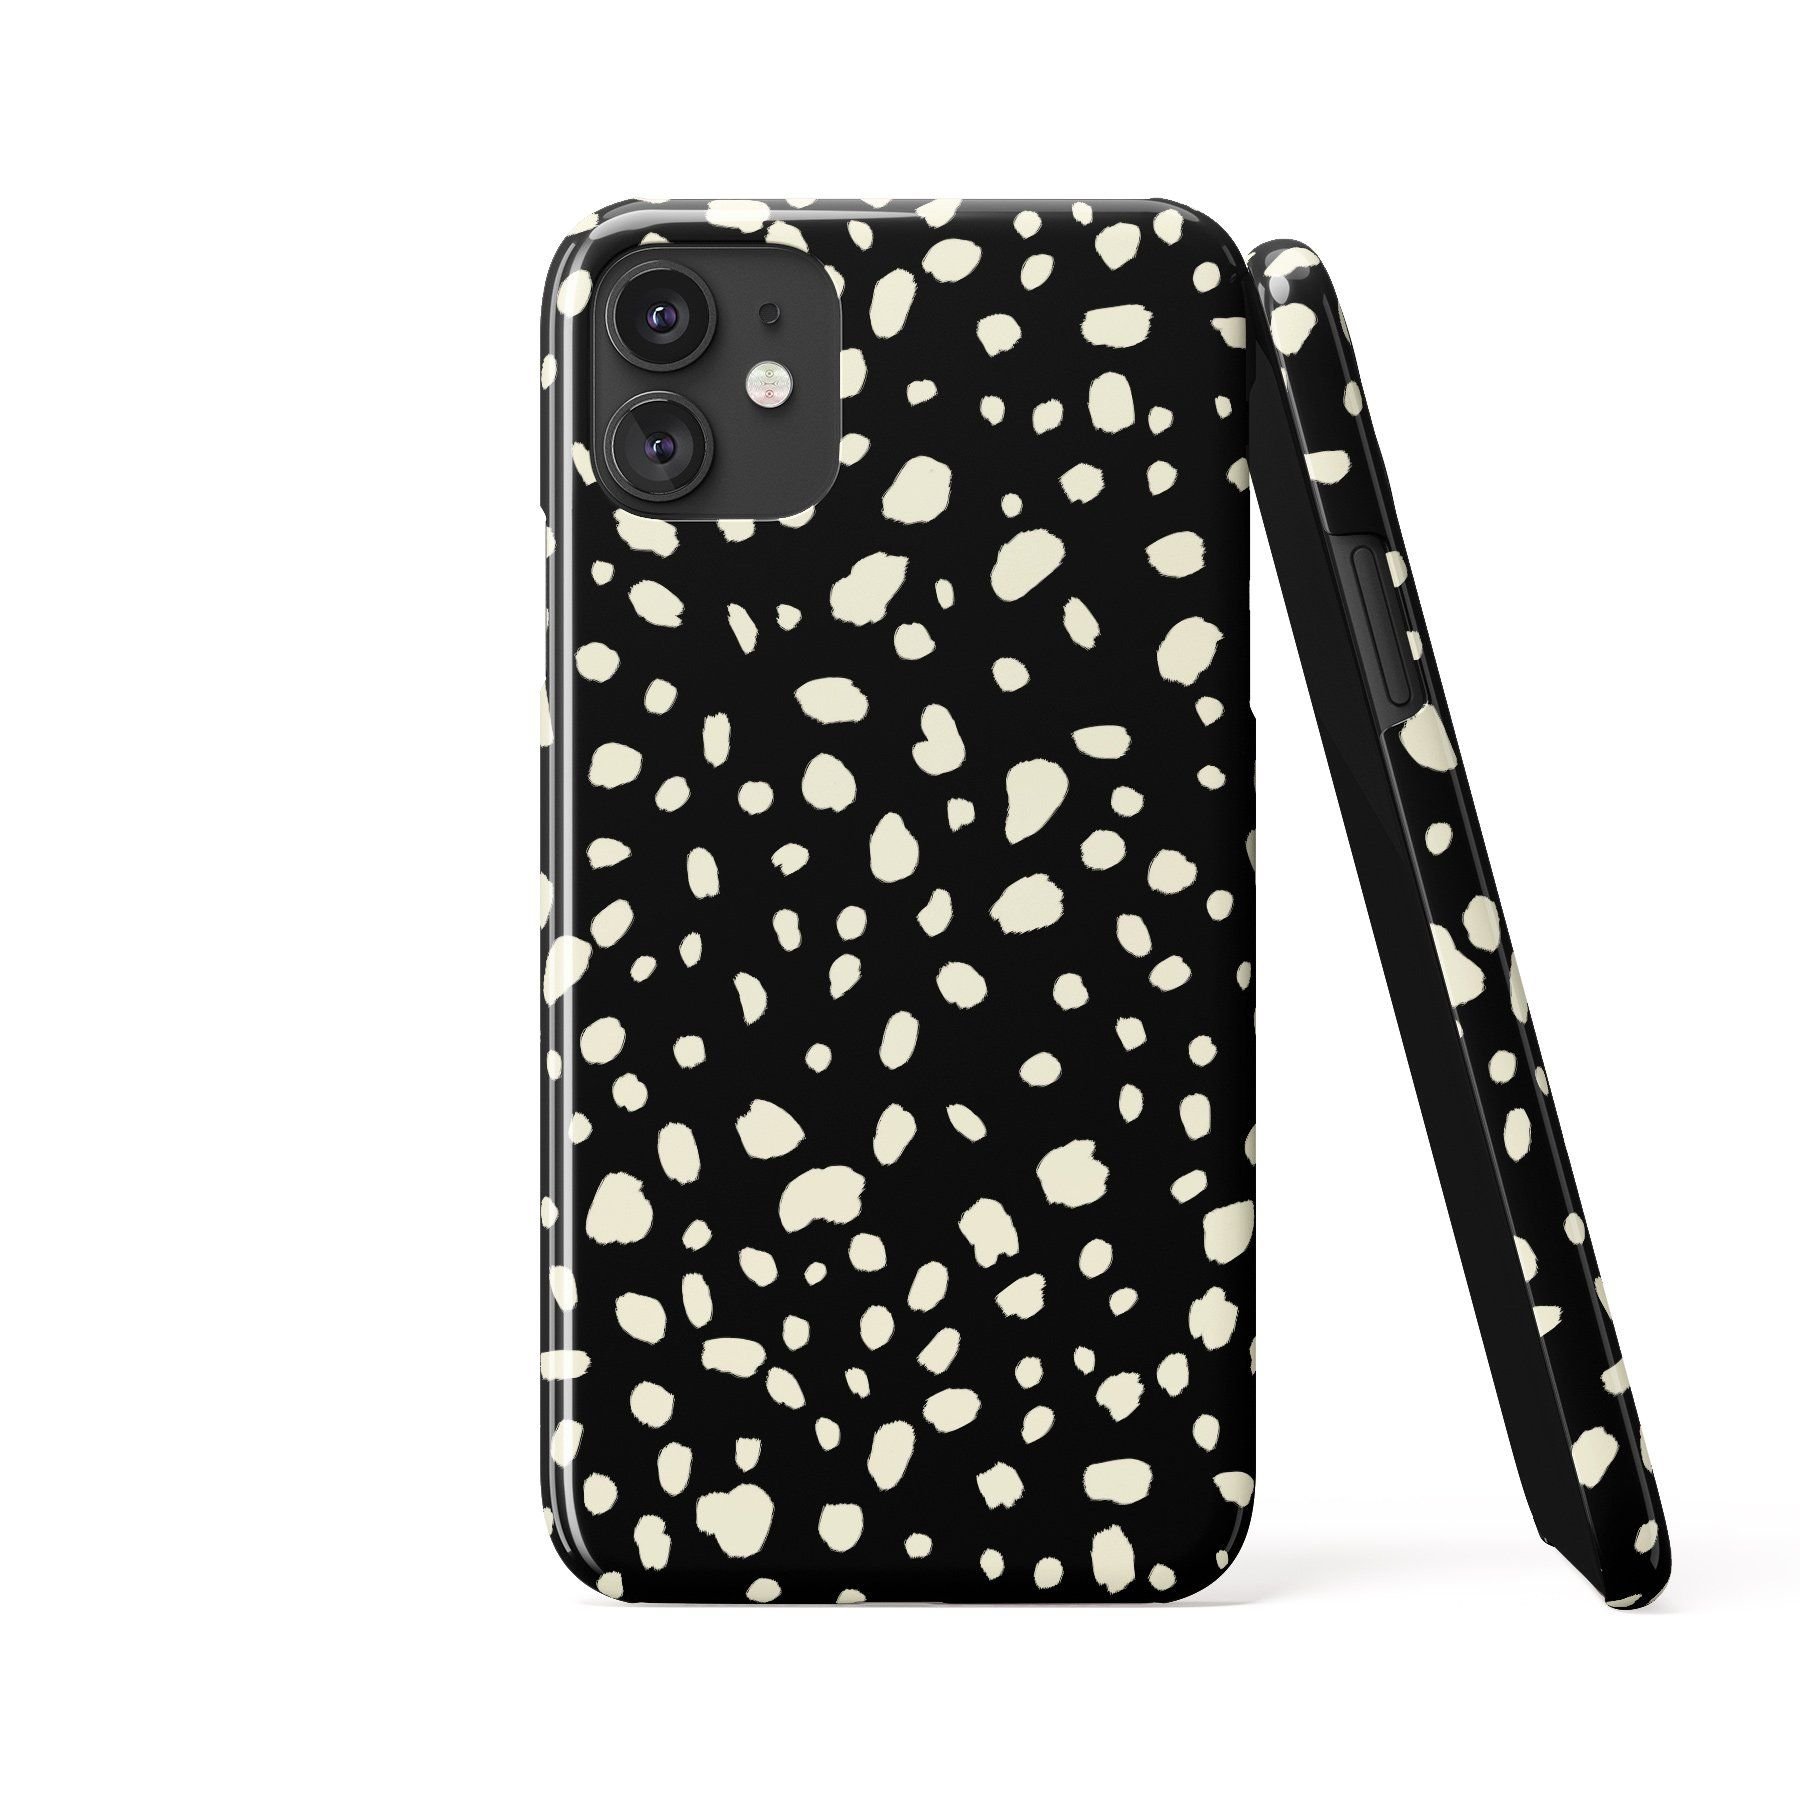 DALMATIAN SPOTS Black Phone Case - Samsung S20 / Tough Case - Gloss